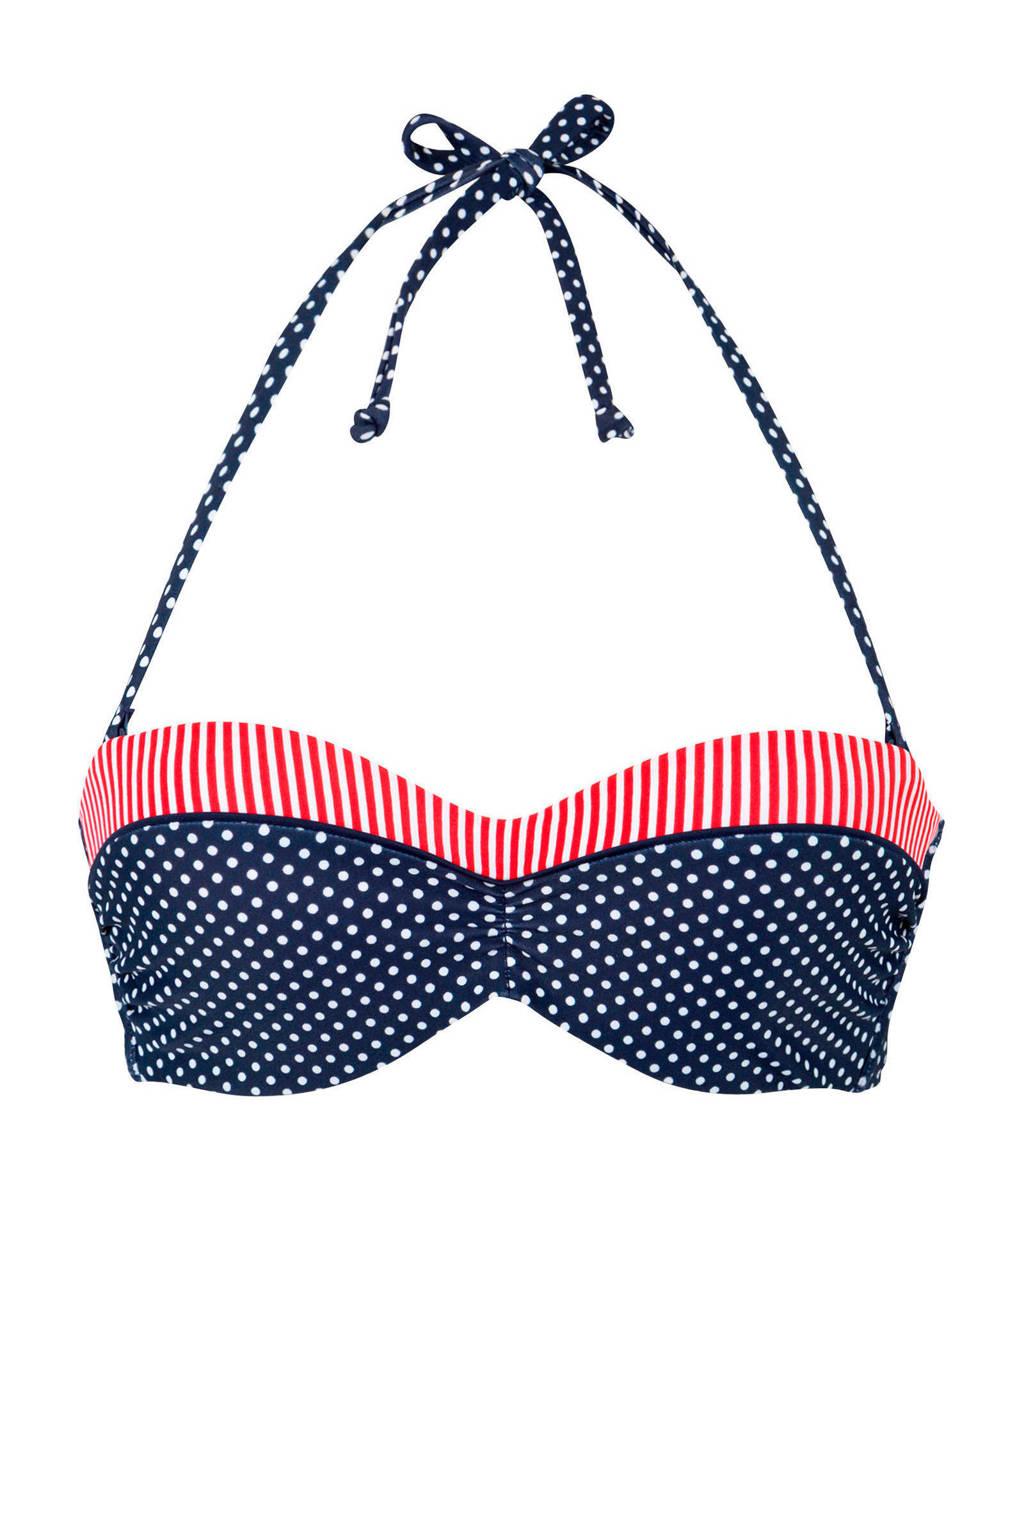 s.Oliver beugel bikinitop met stippen marine, Marine/wit